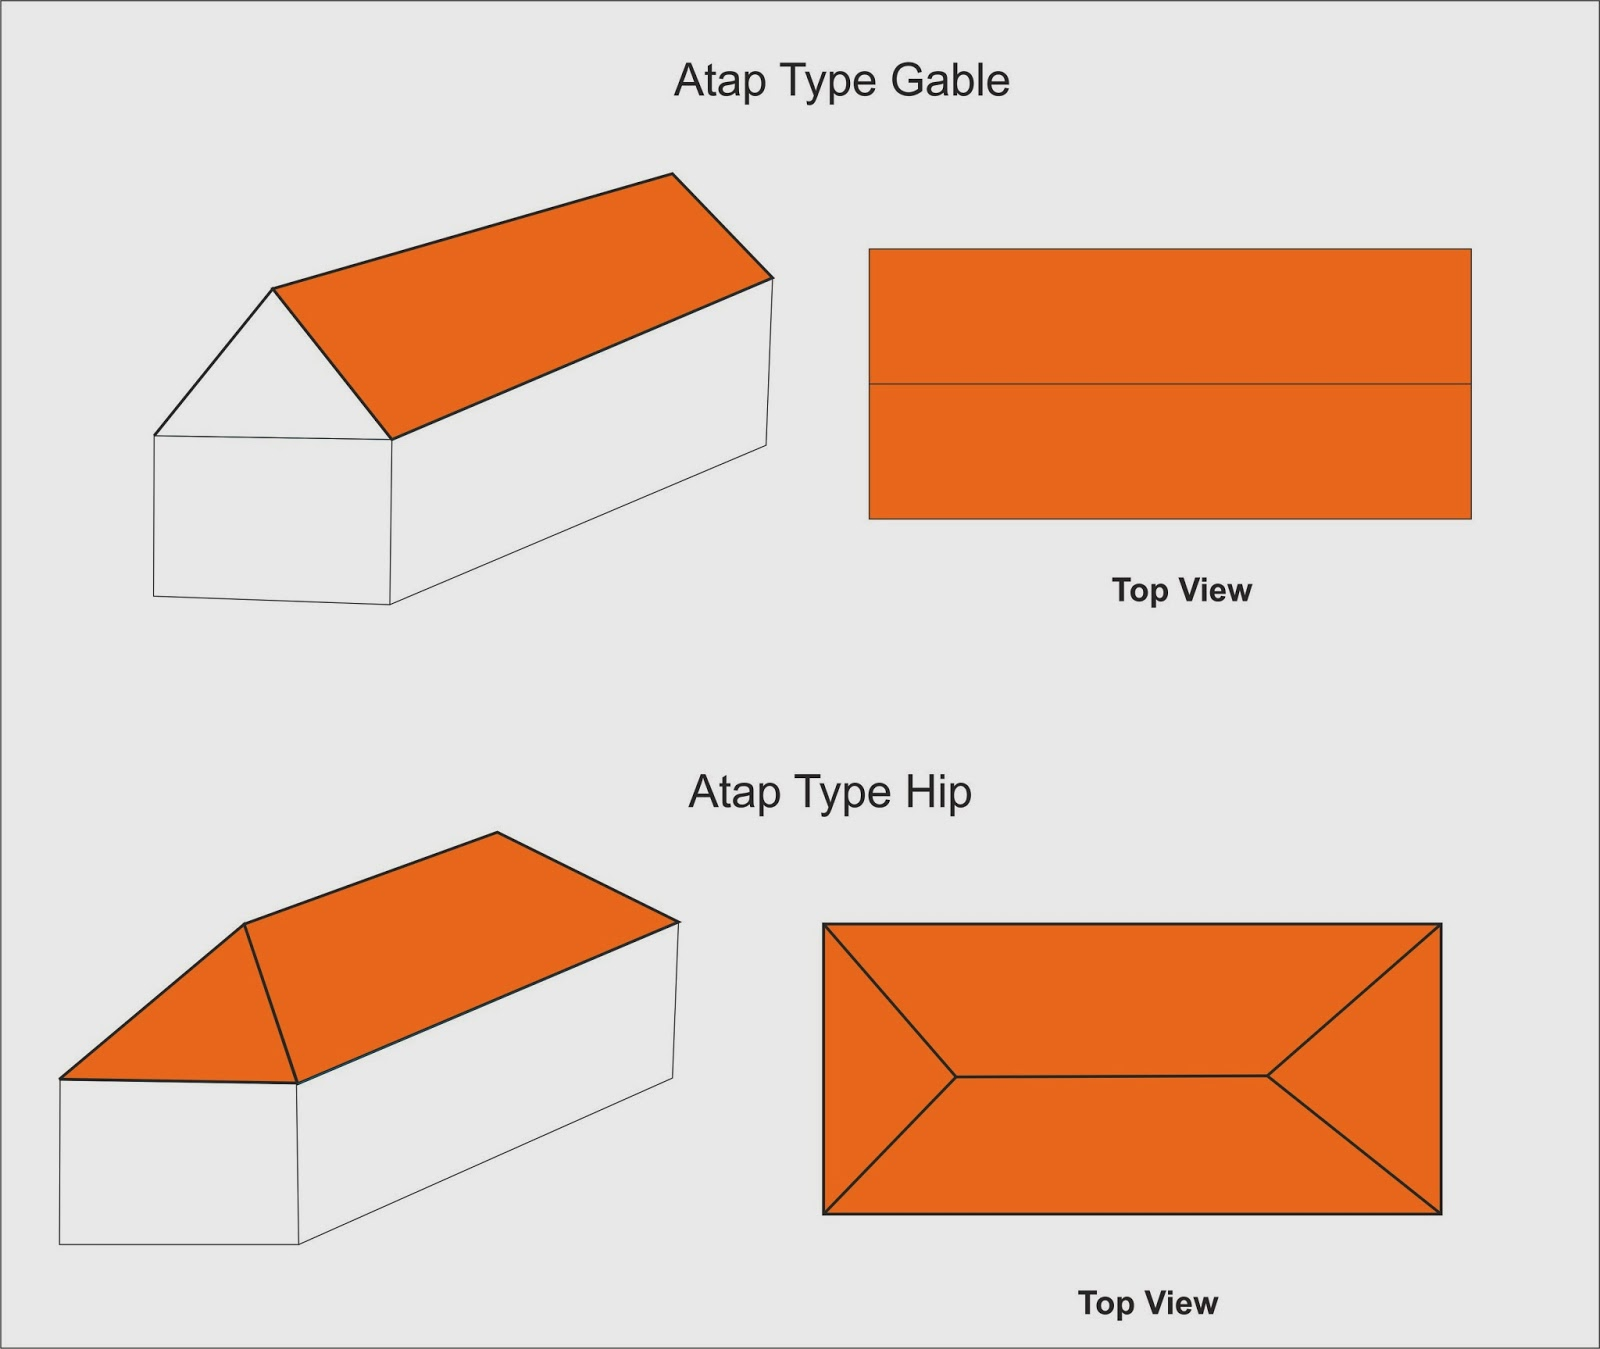 Cara Menghitung Luasan Atap Bangunan m2 Artikel Teknik